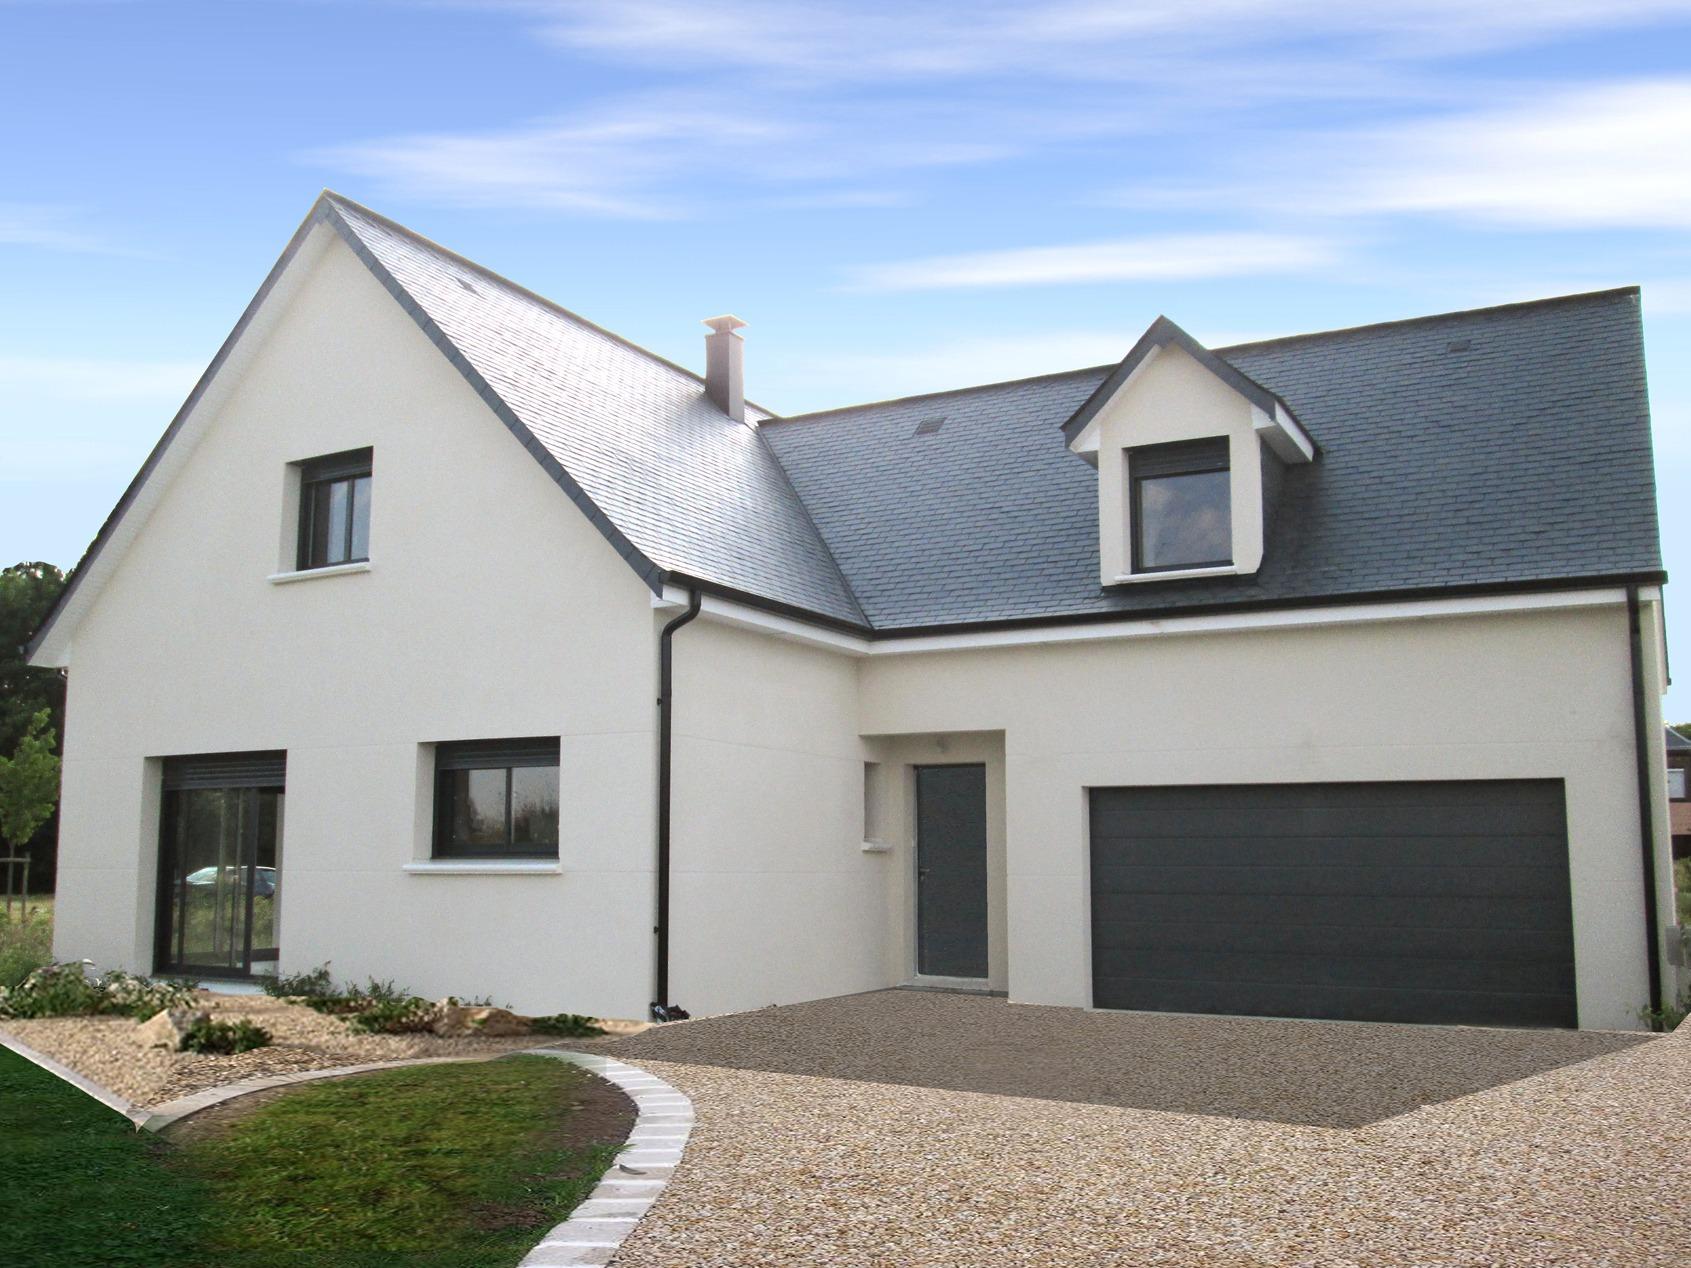 Maisons + Terrains du constructeur CASTOR MESNIL ESNARD • 130 m² • MONTVILLE